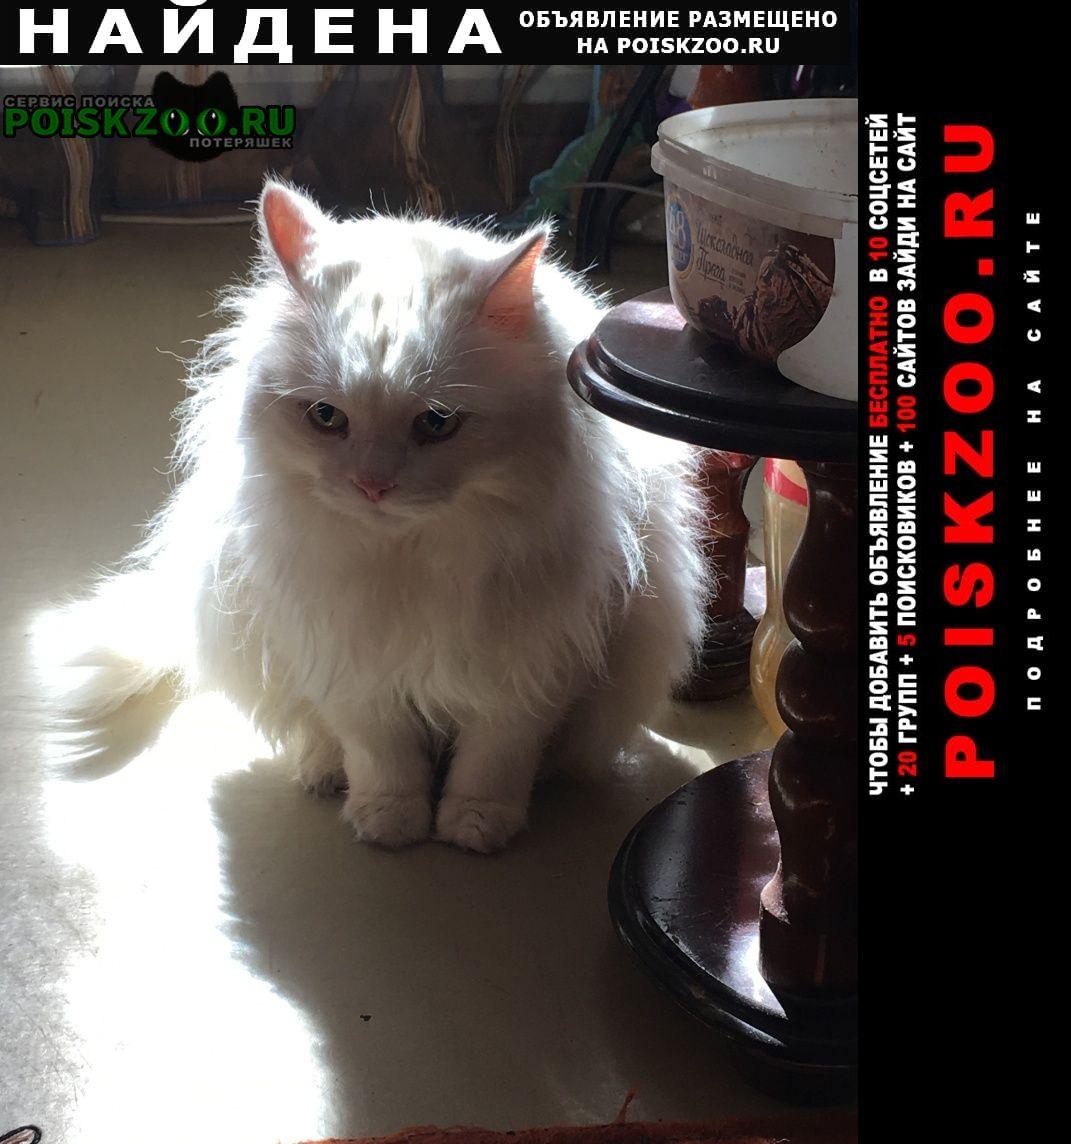 Найдена кошка в микрорайоне левобережный Химки